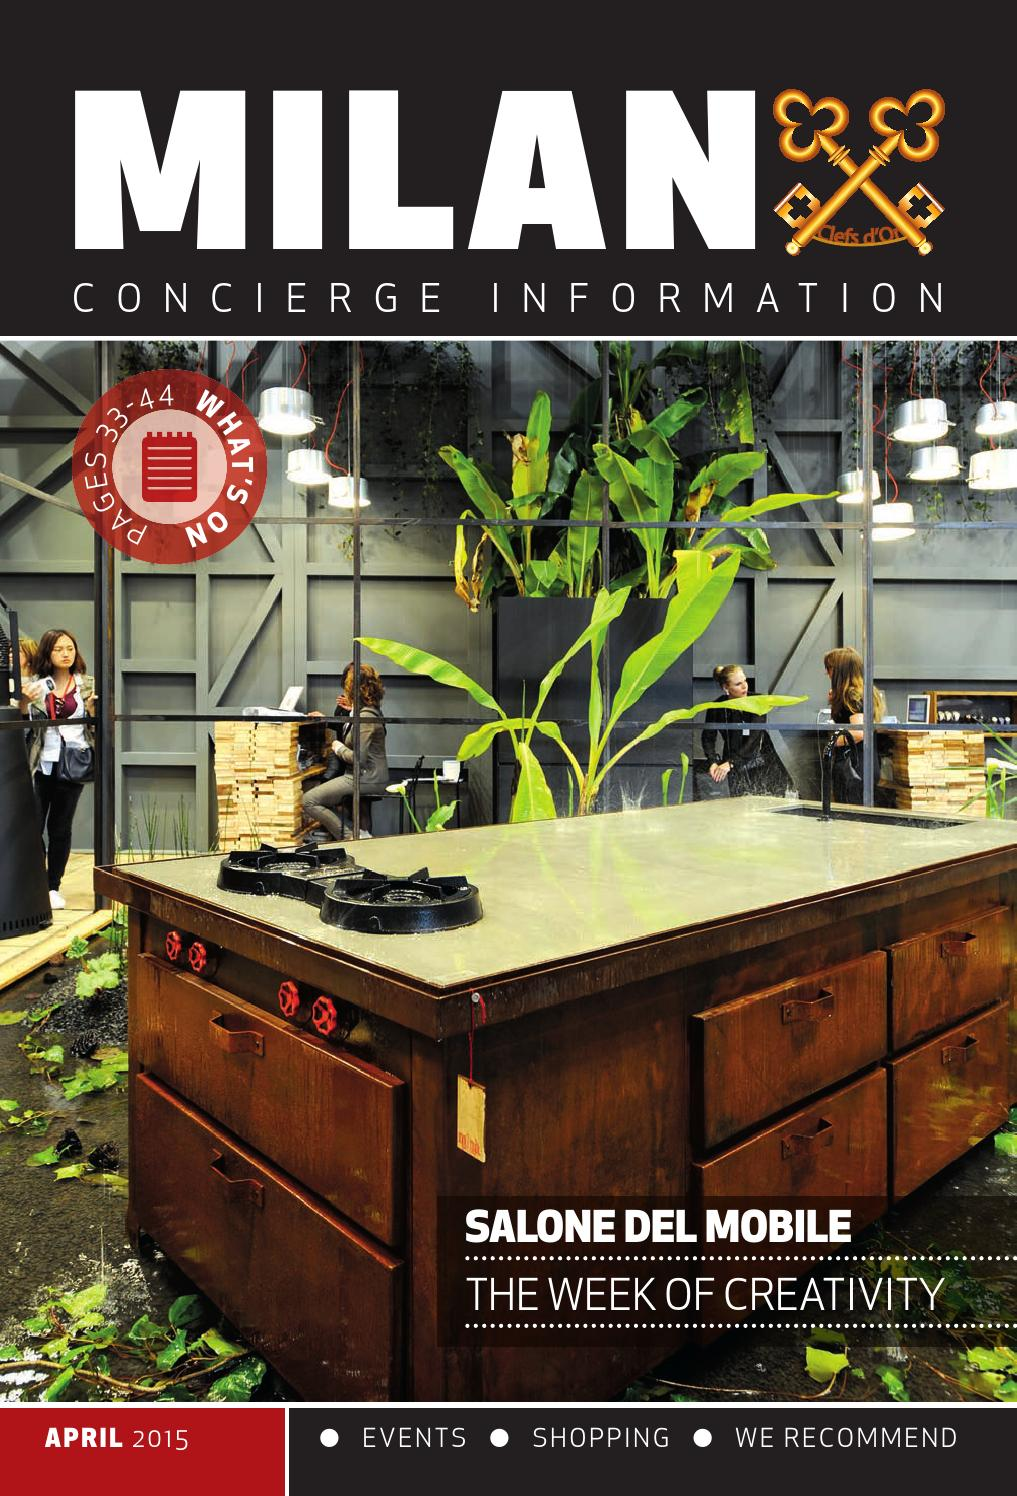 Milano Concierge Aprile 2015 By Alberto Valeri Issuu